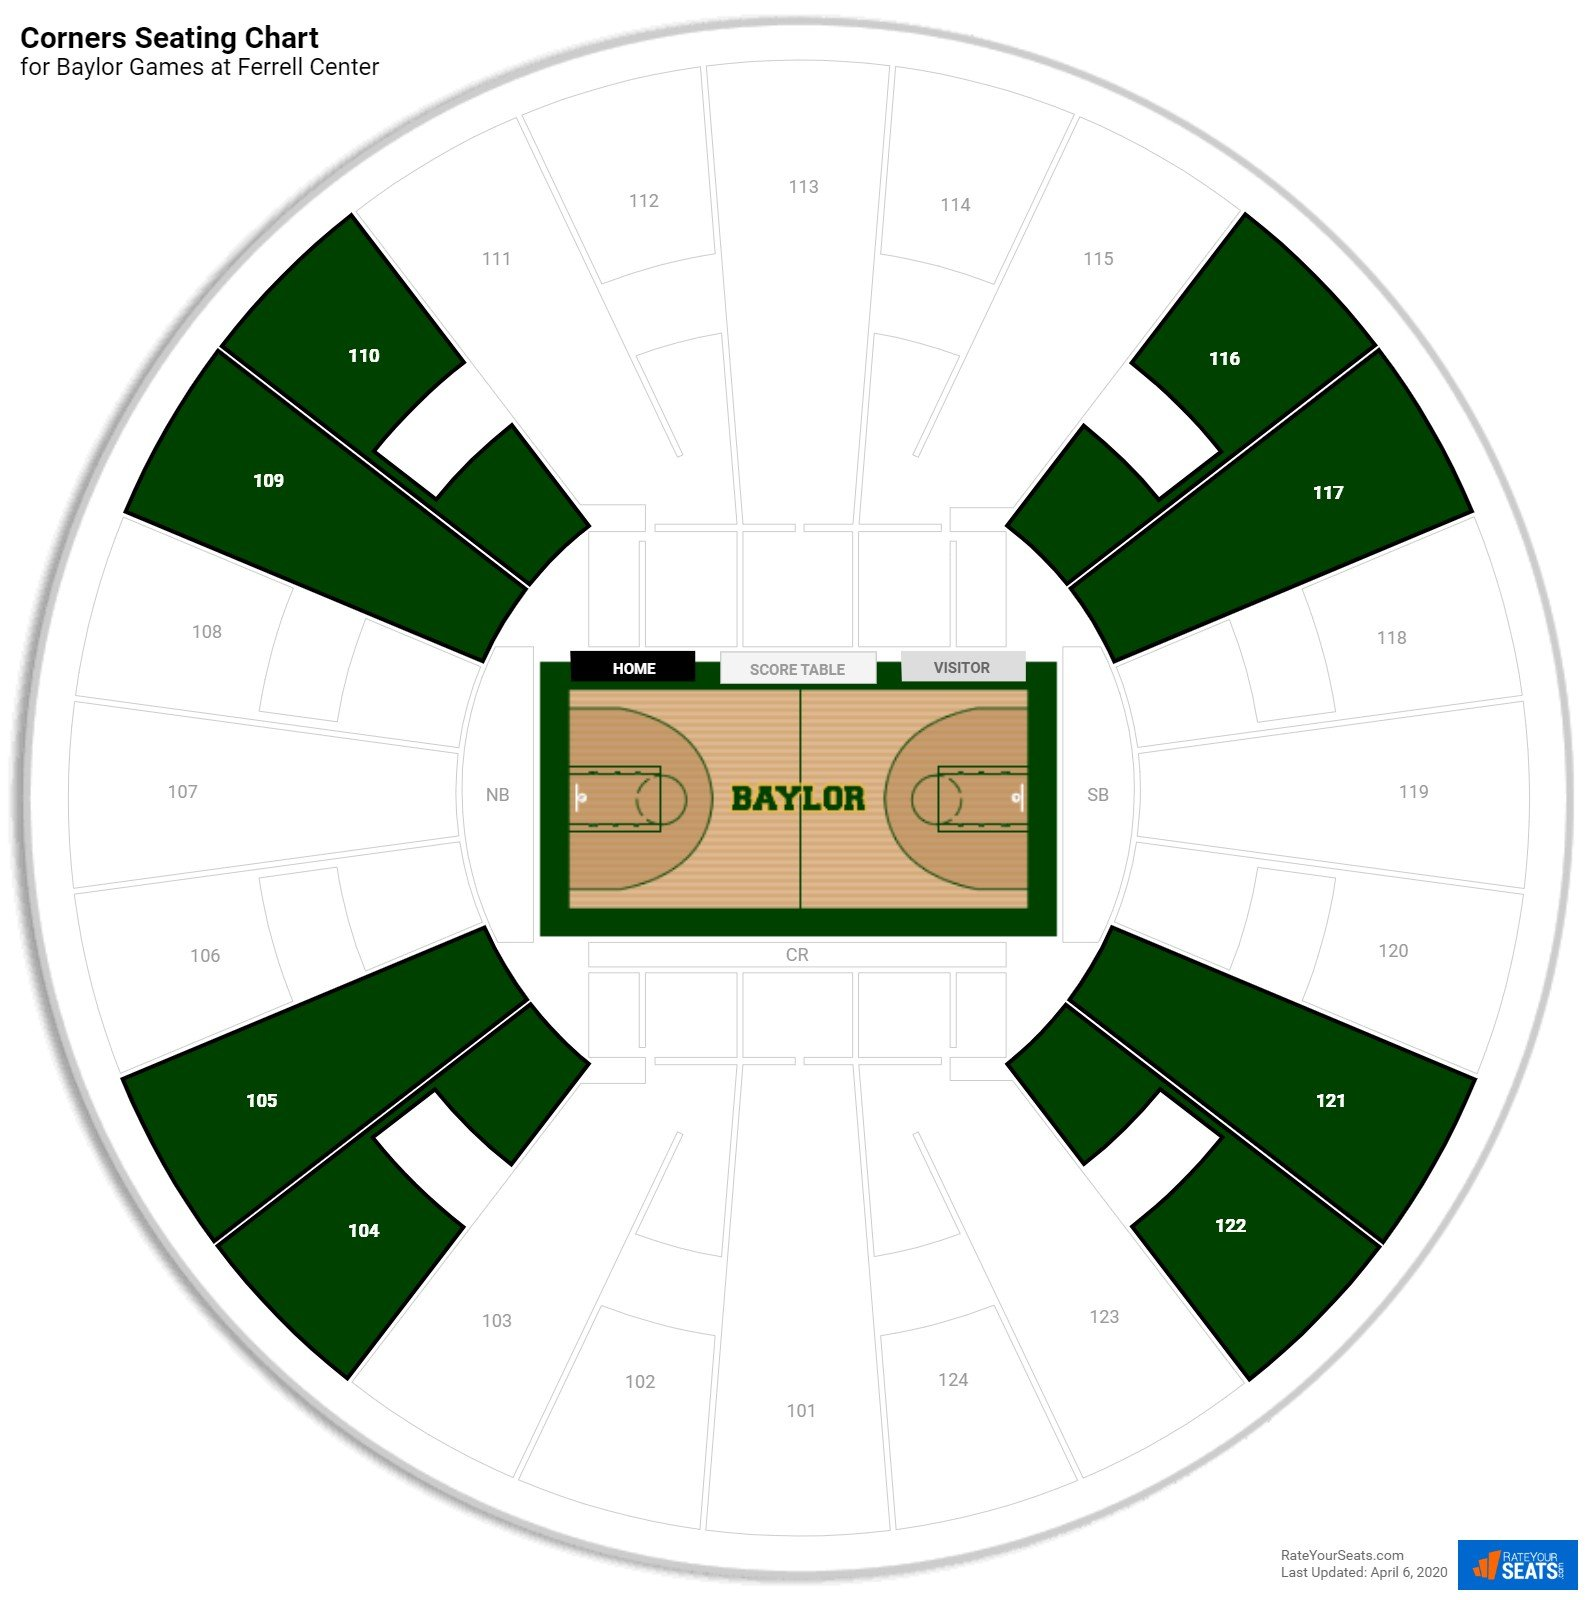 Ferrell Center Corners Seating Chart